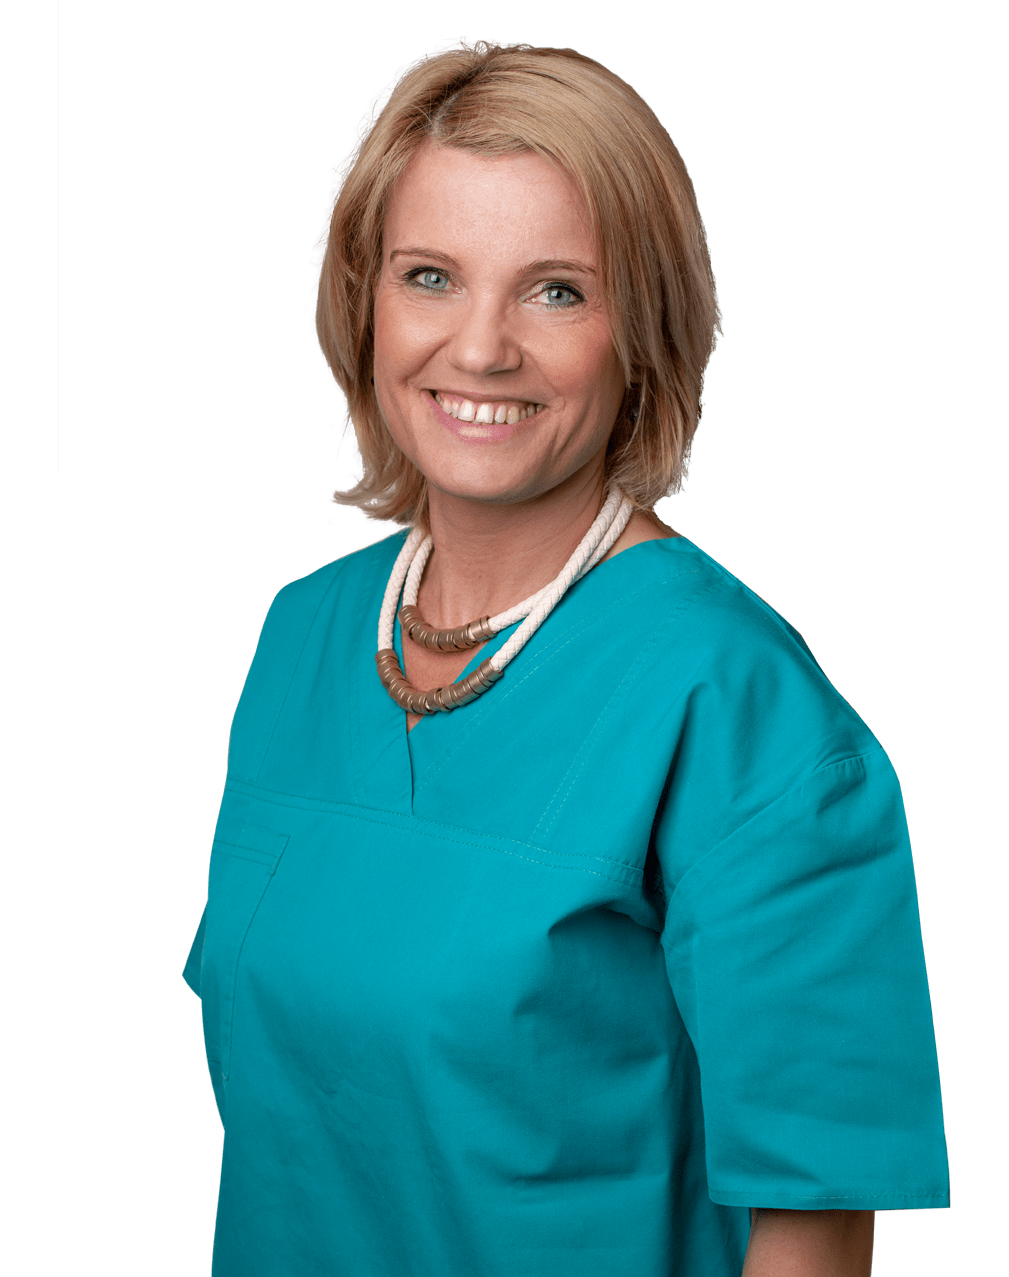 Gasztroenterológiai Dunaharaszti - Dr. Kozma Brigitta